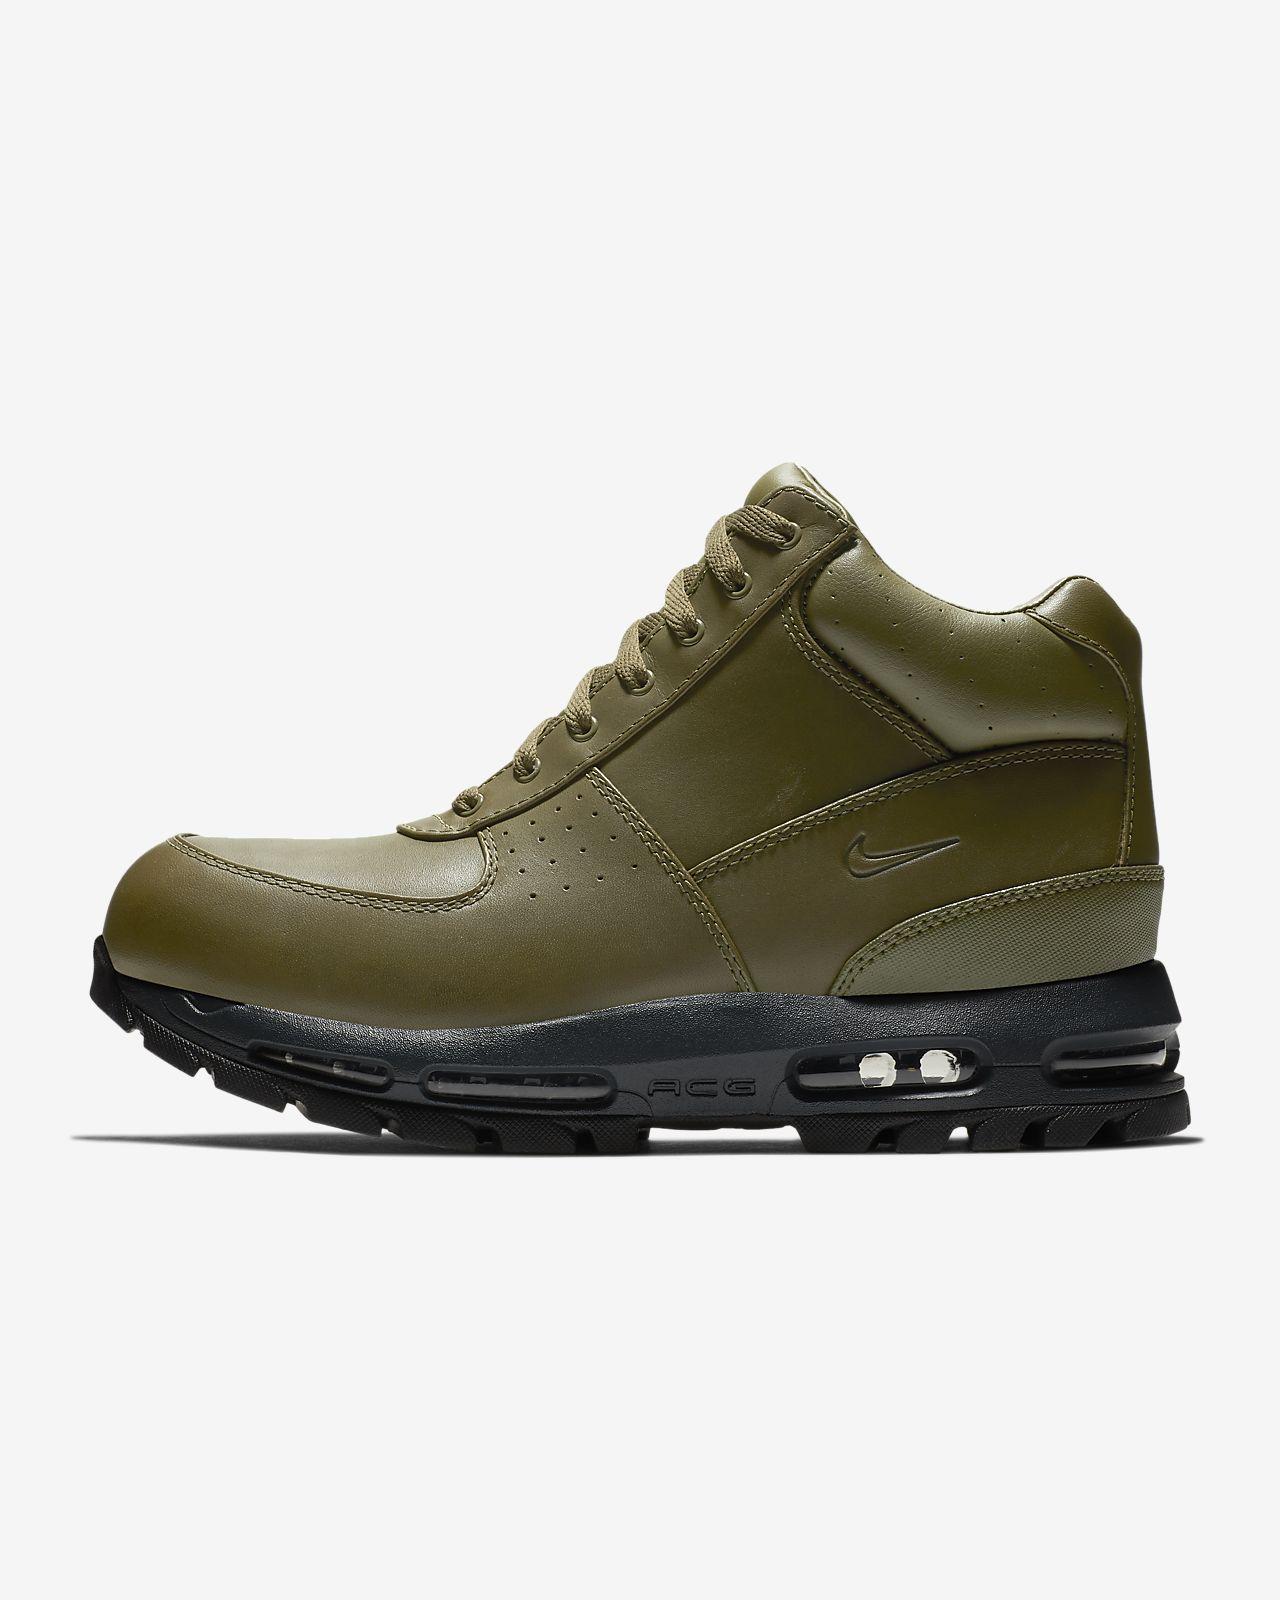 UK Nike Air Max Goaterra Boots BlackBlack Factory Price